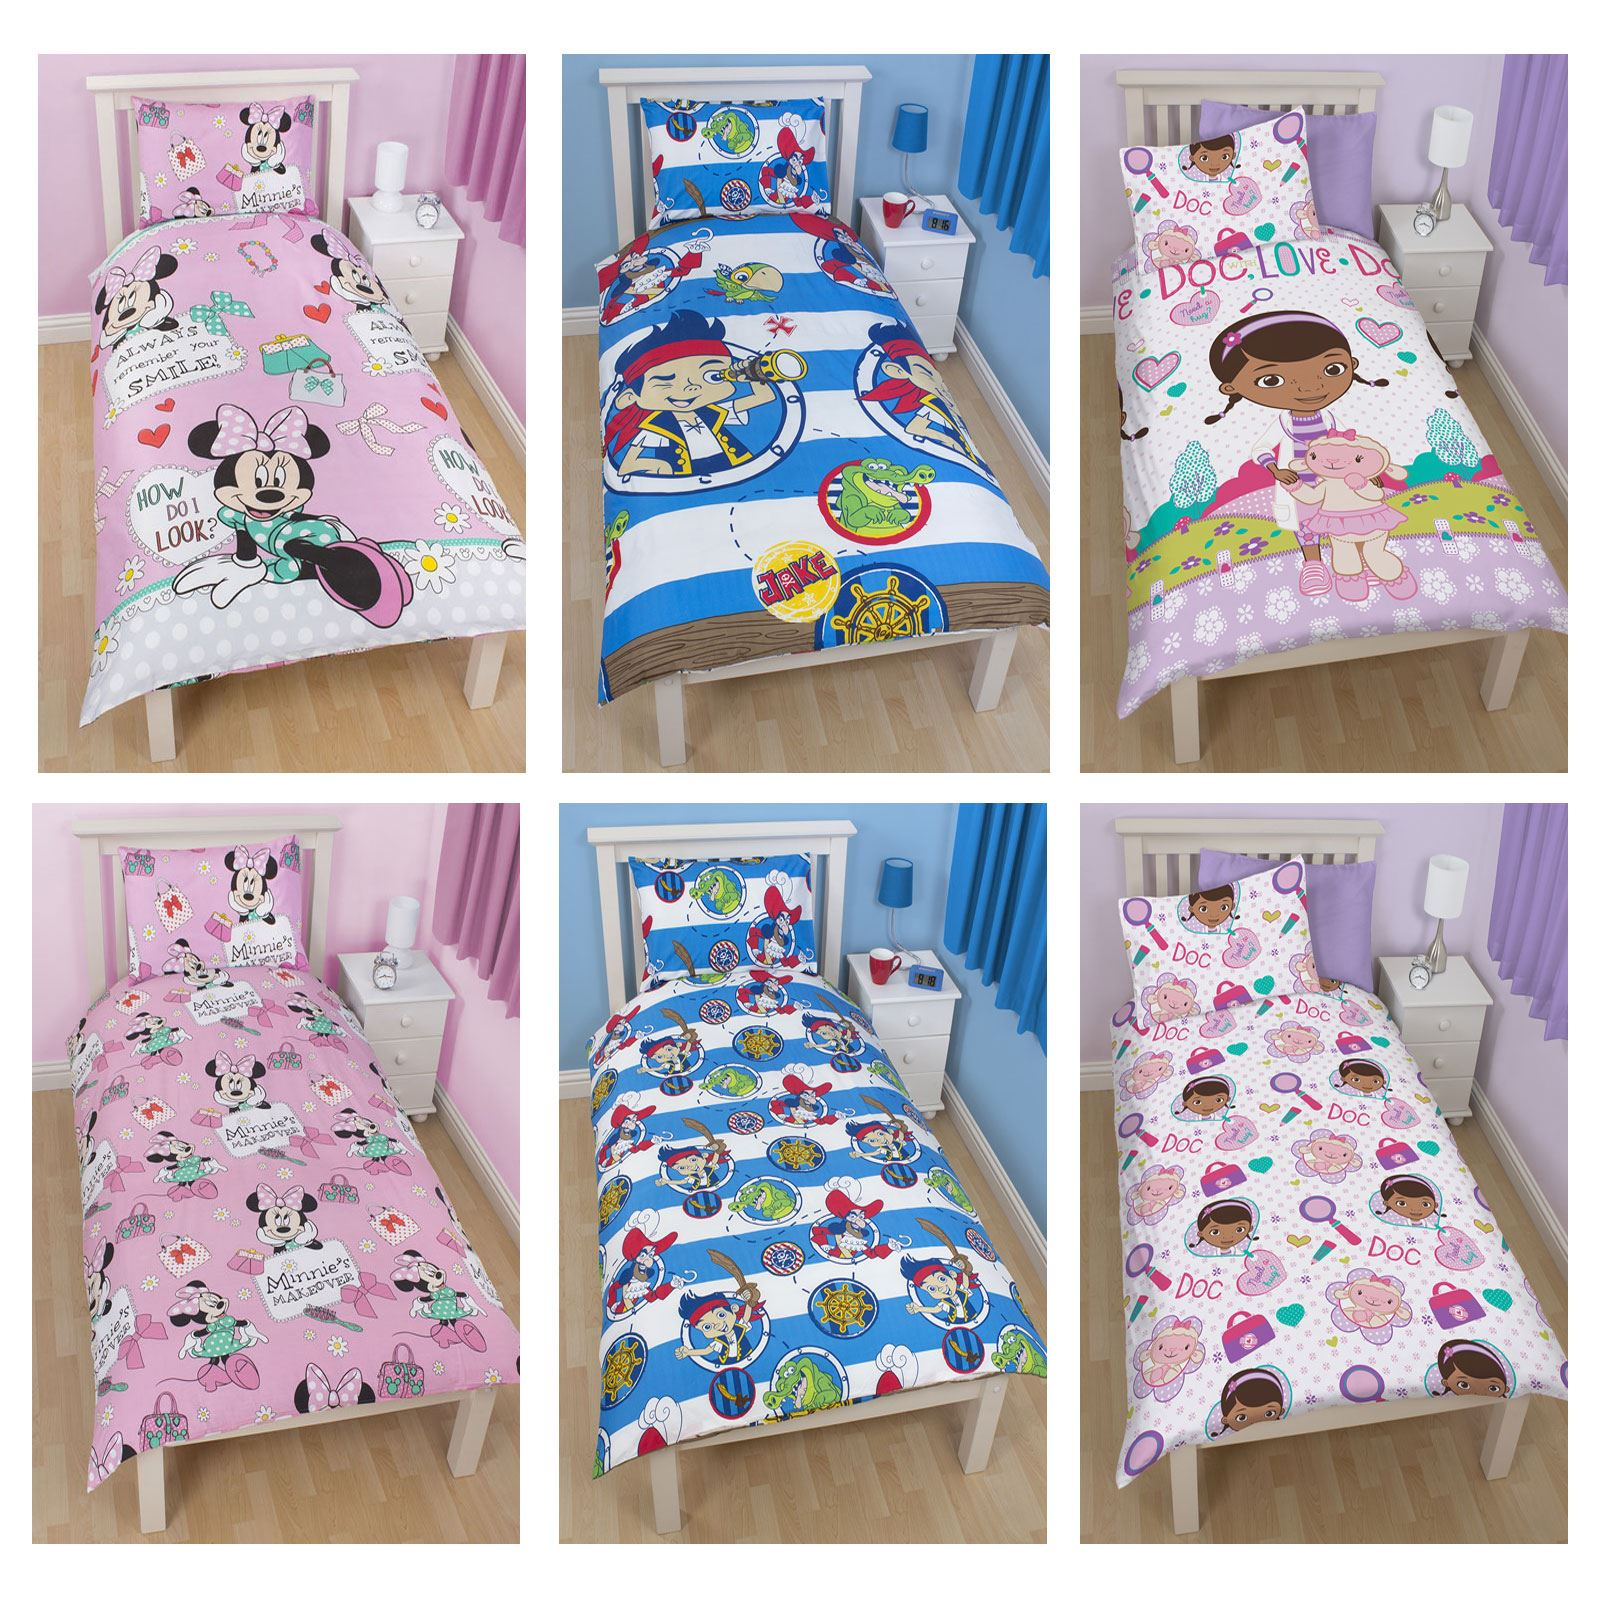 disney character twin duvet cover bed sheets bedding sets for boys and girls ebay. Black Bedroom Furniture Sets. Home Design Ideas